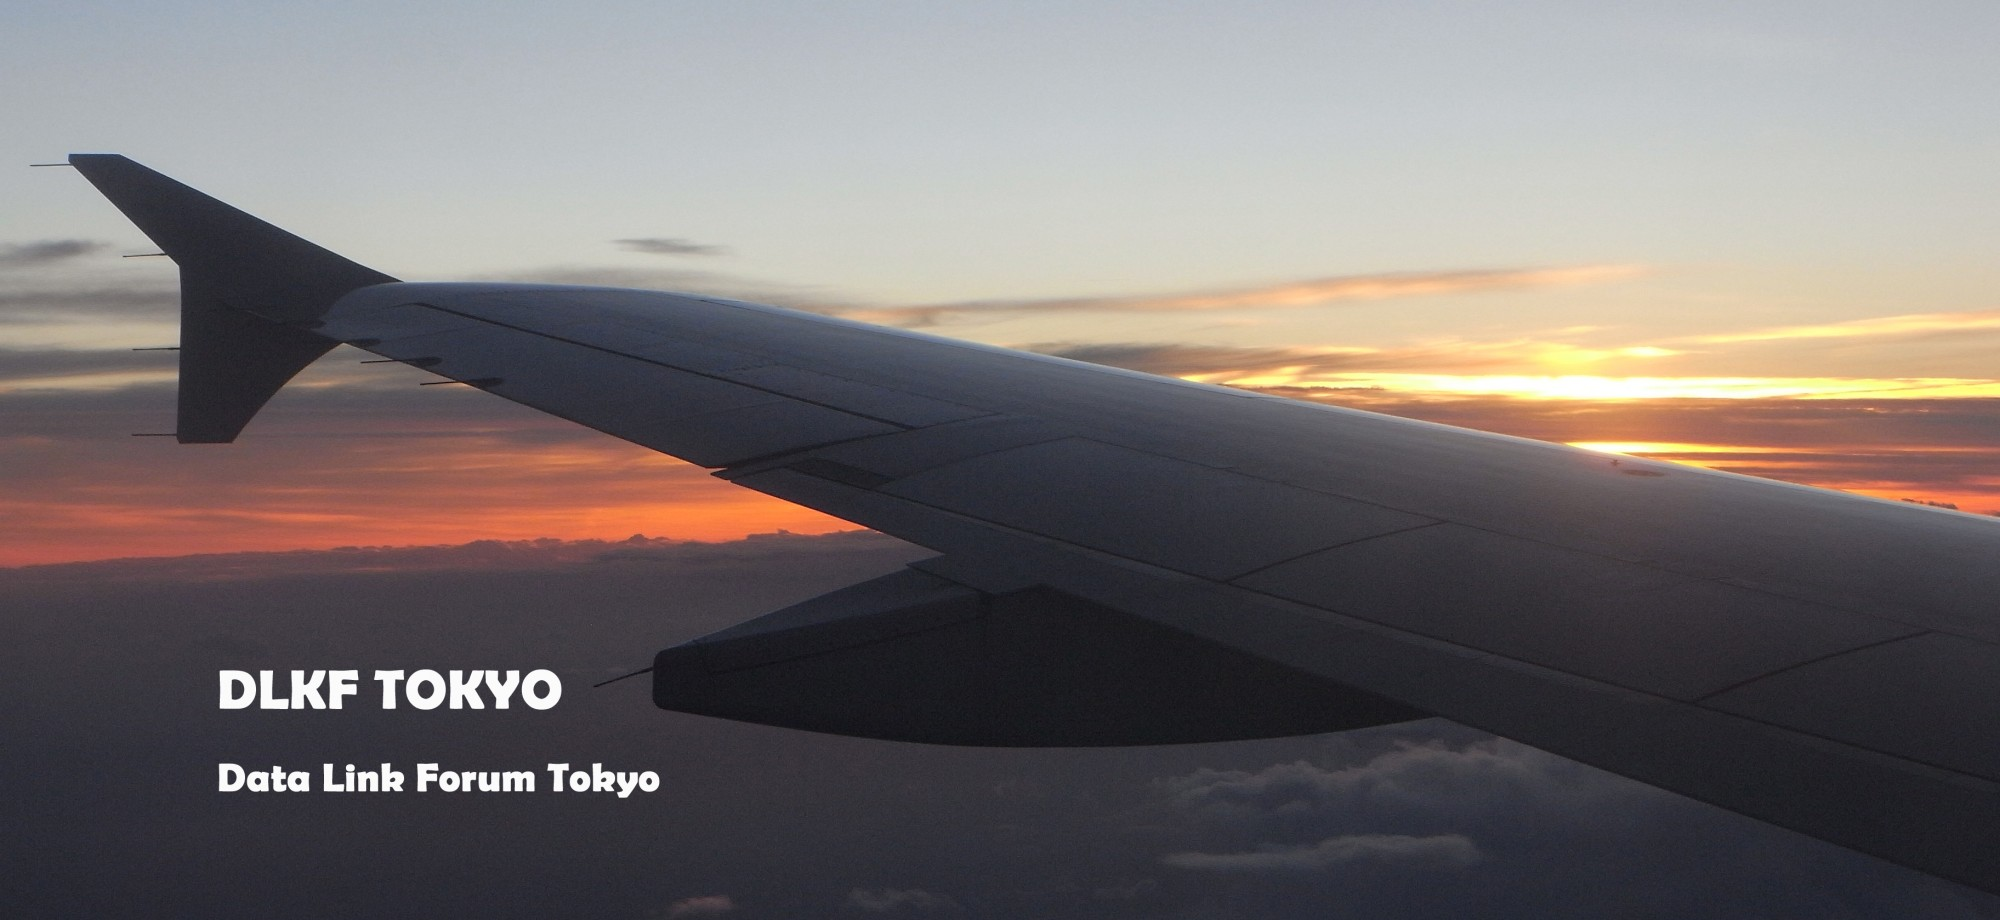 DLKF TOKYO